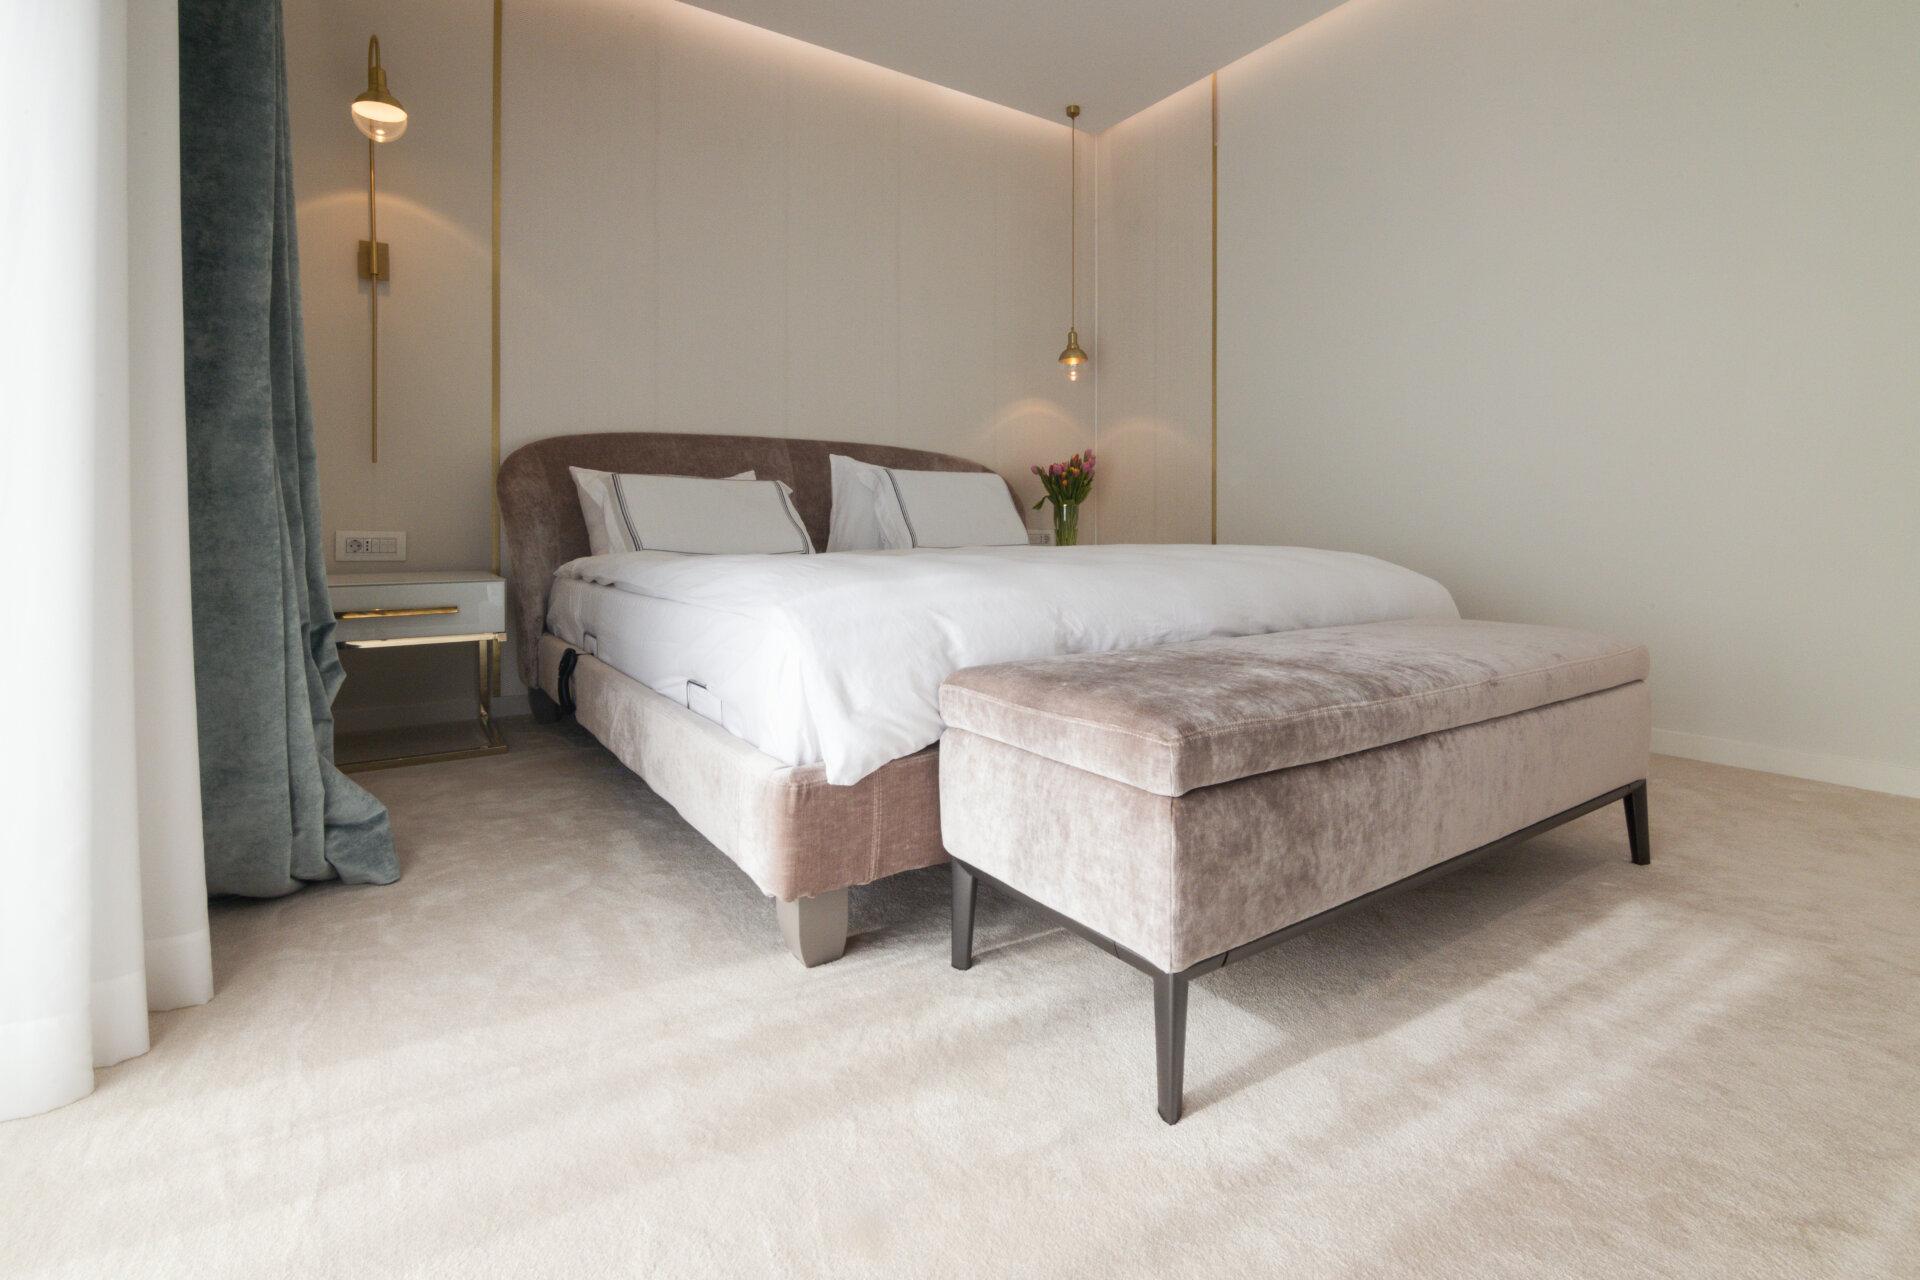 20210303-carpet&more-vila-bogdan-craiova-by-hugmedia-31